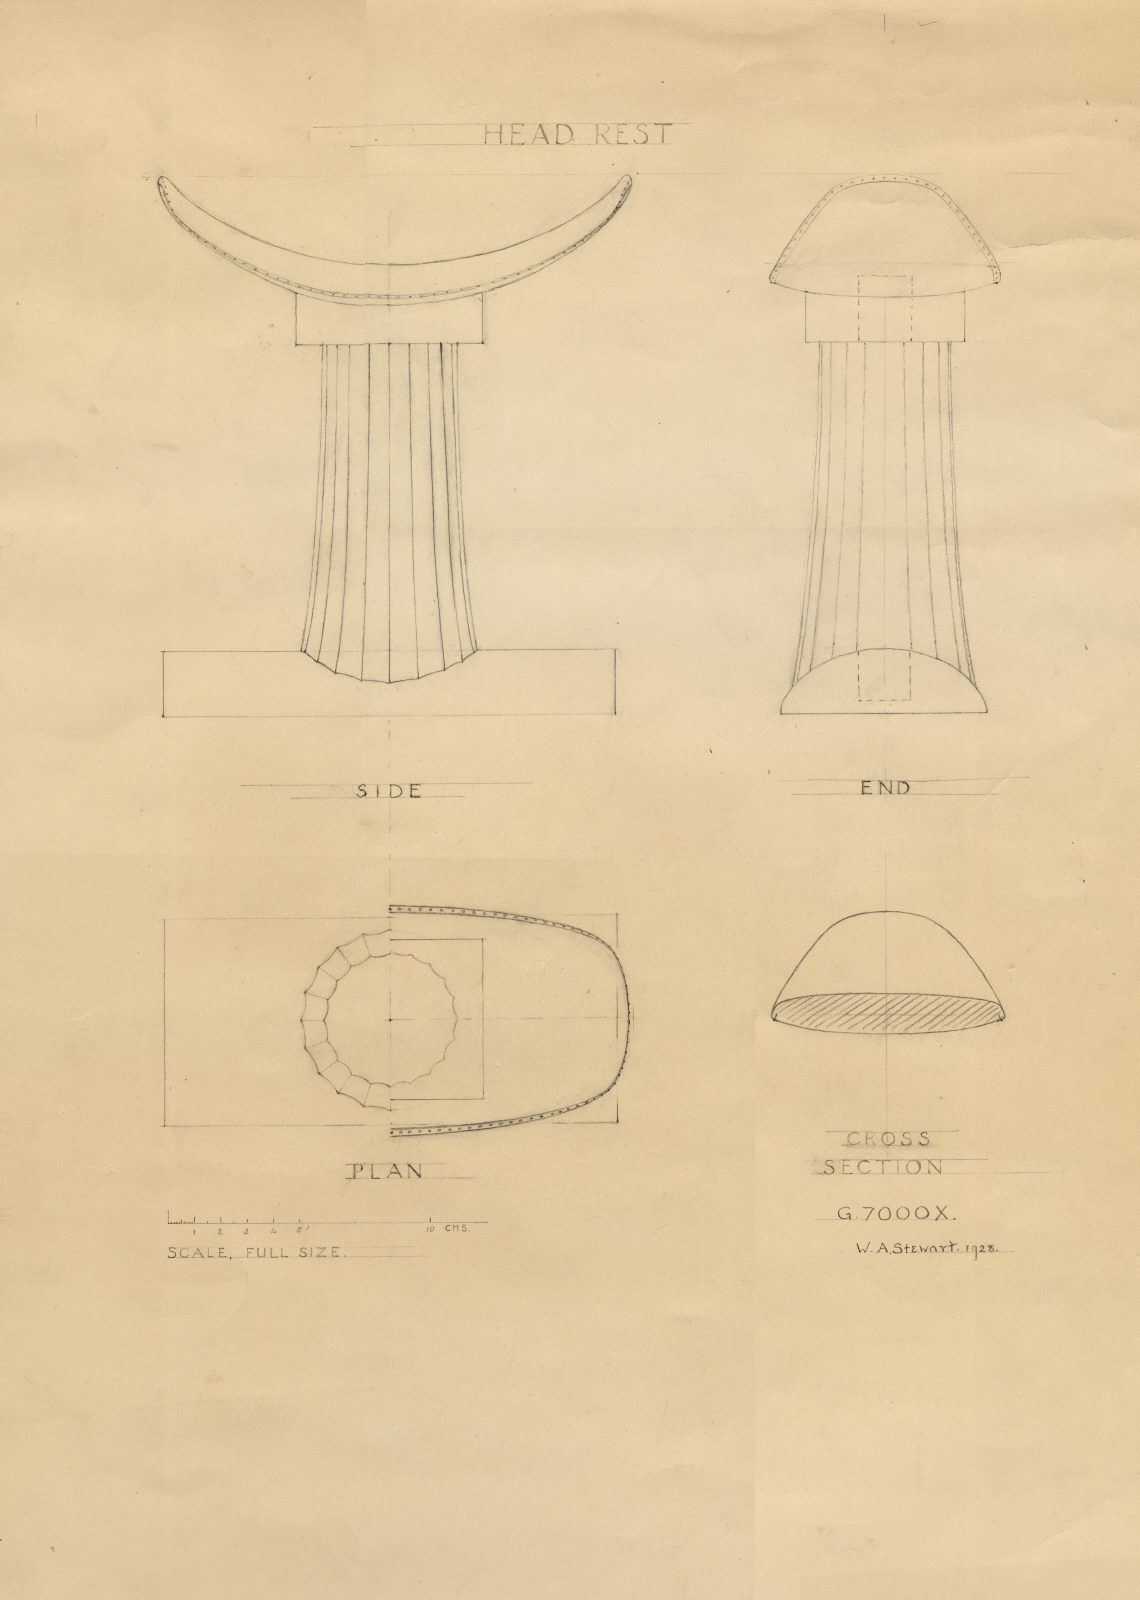 Drawings: G 7000 X: headrest